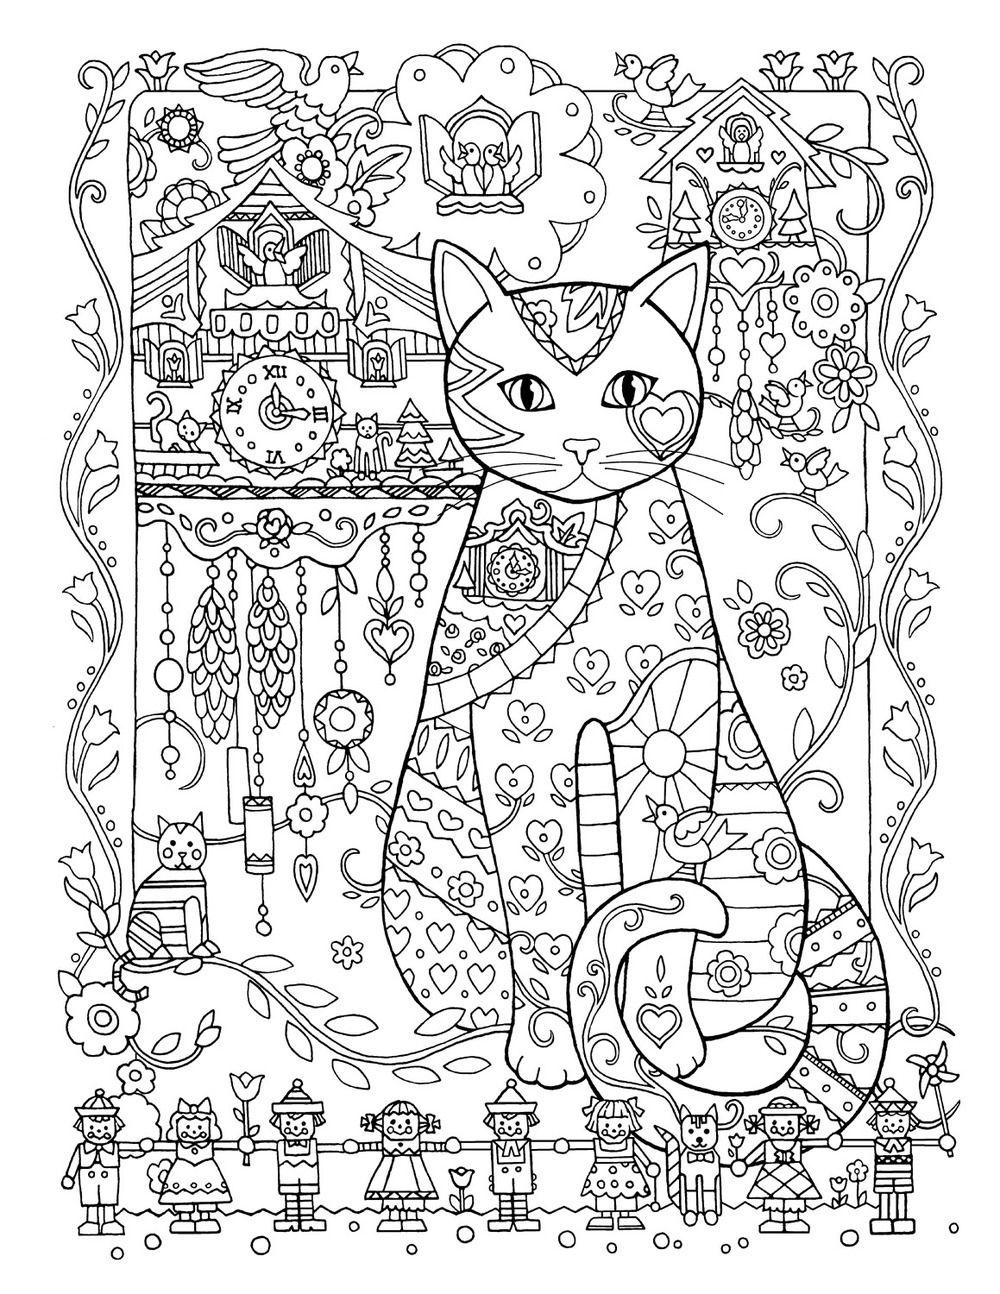 Creative cats colouring book cuckoo clocks by marjorie sarnat